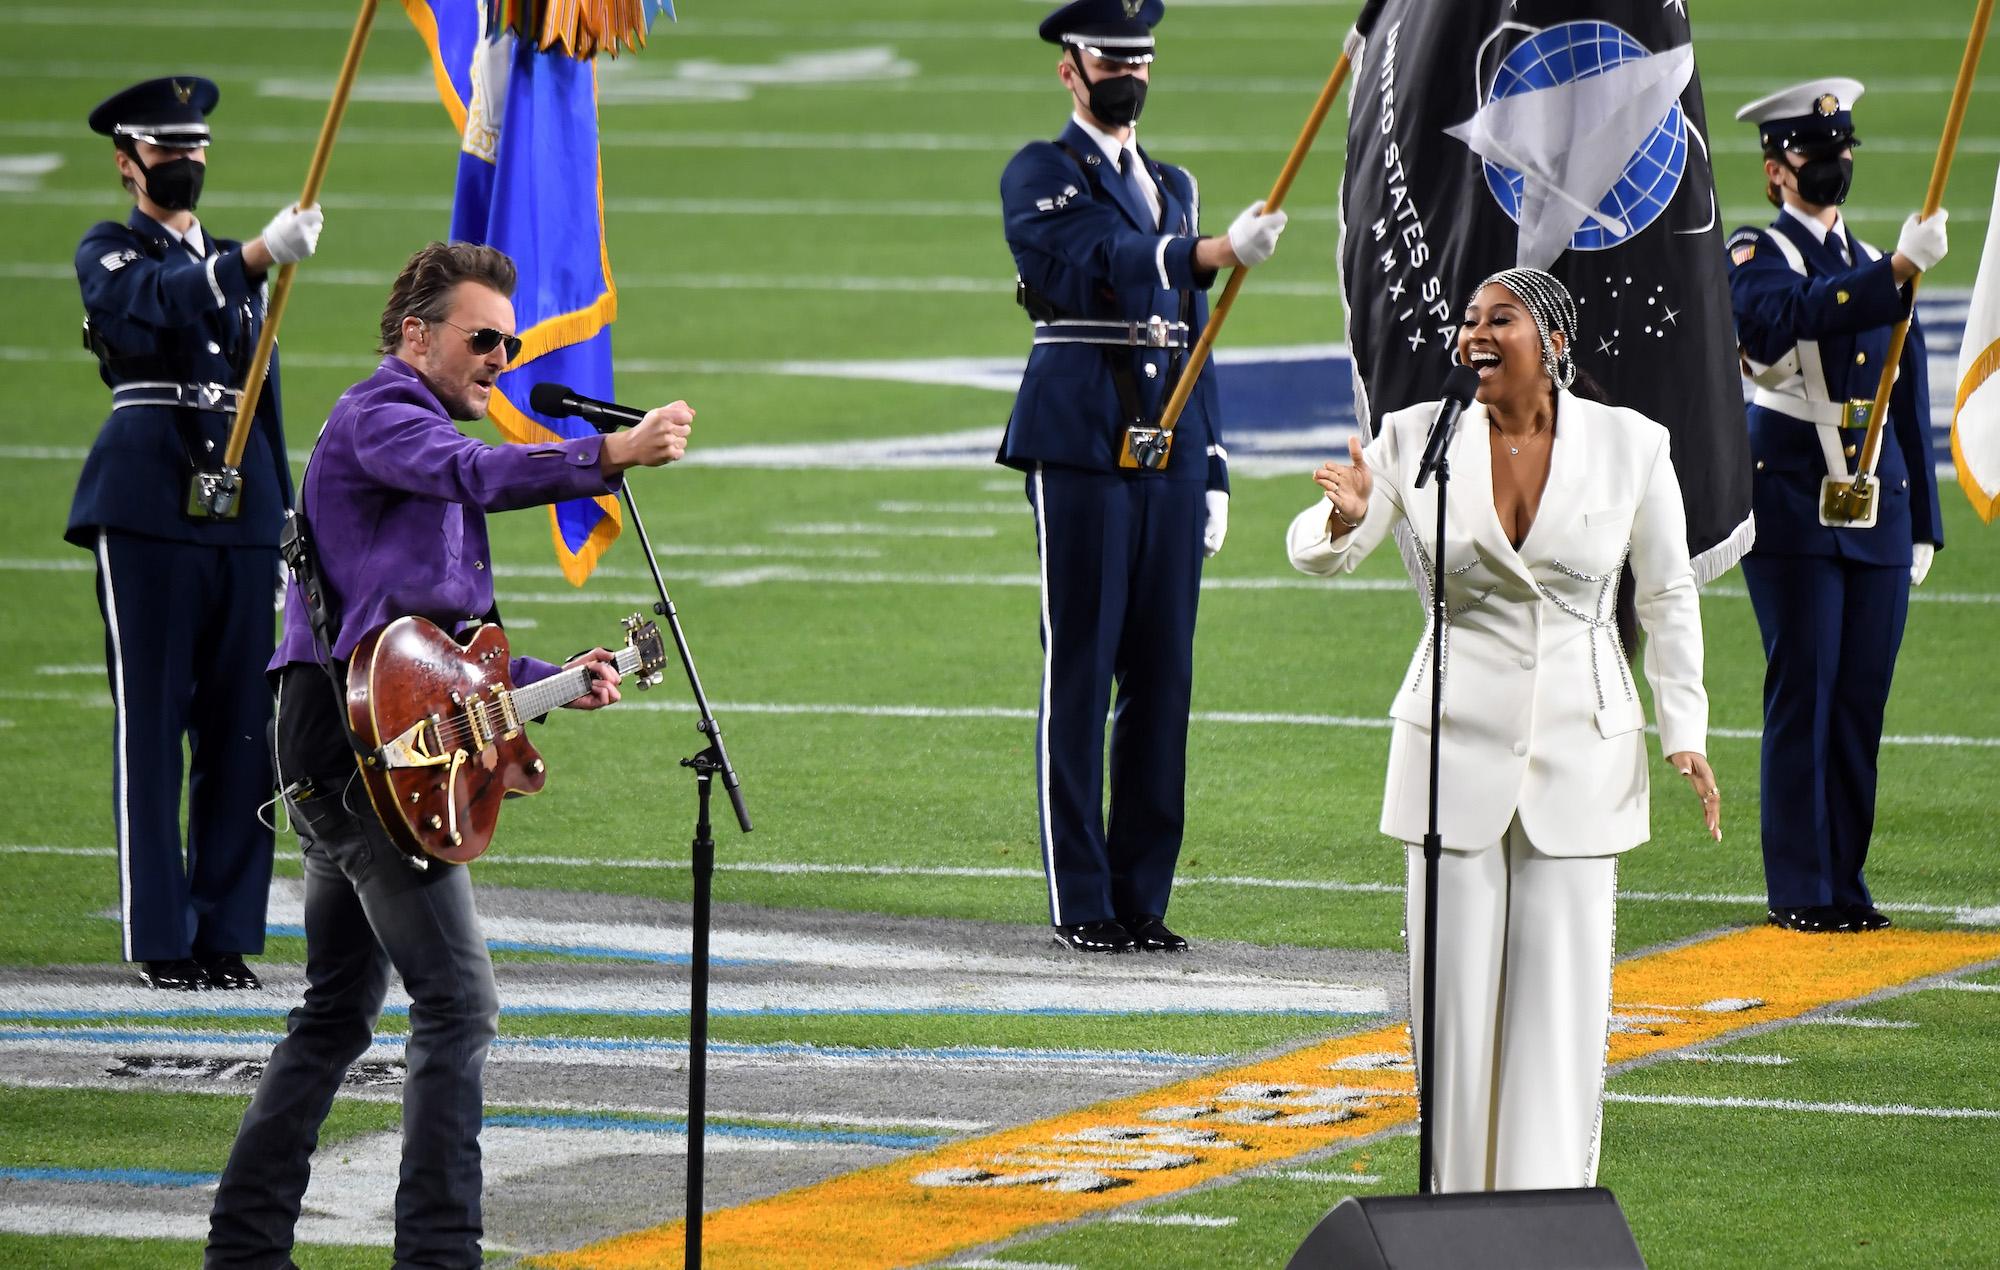 Watch Eric Church and Jazmine Sullivan play 'Star-Spangled Banner' at Super Bowl